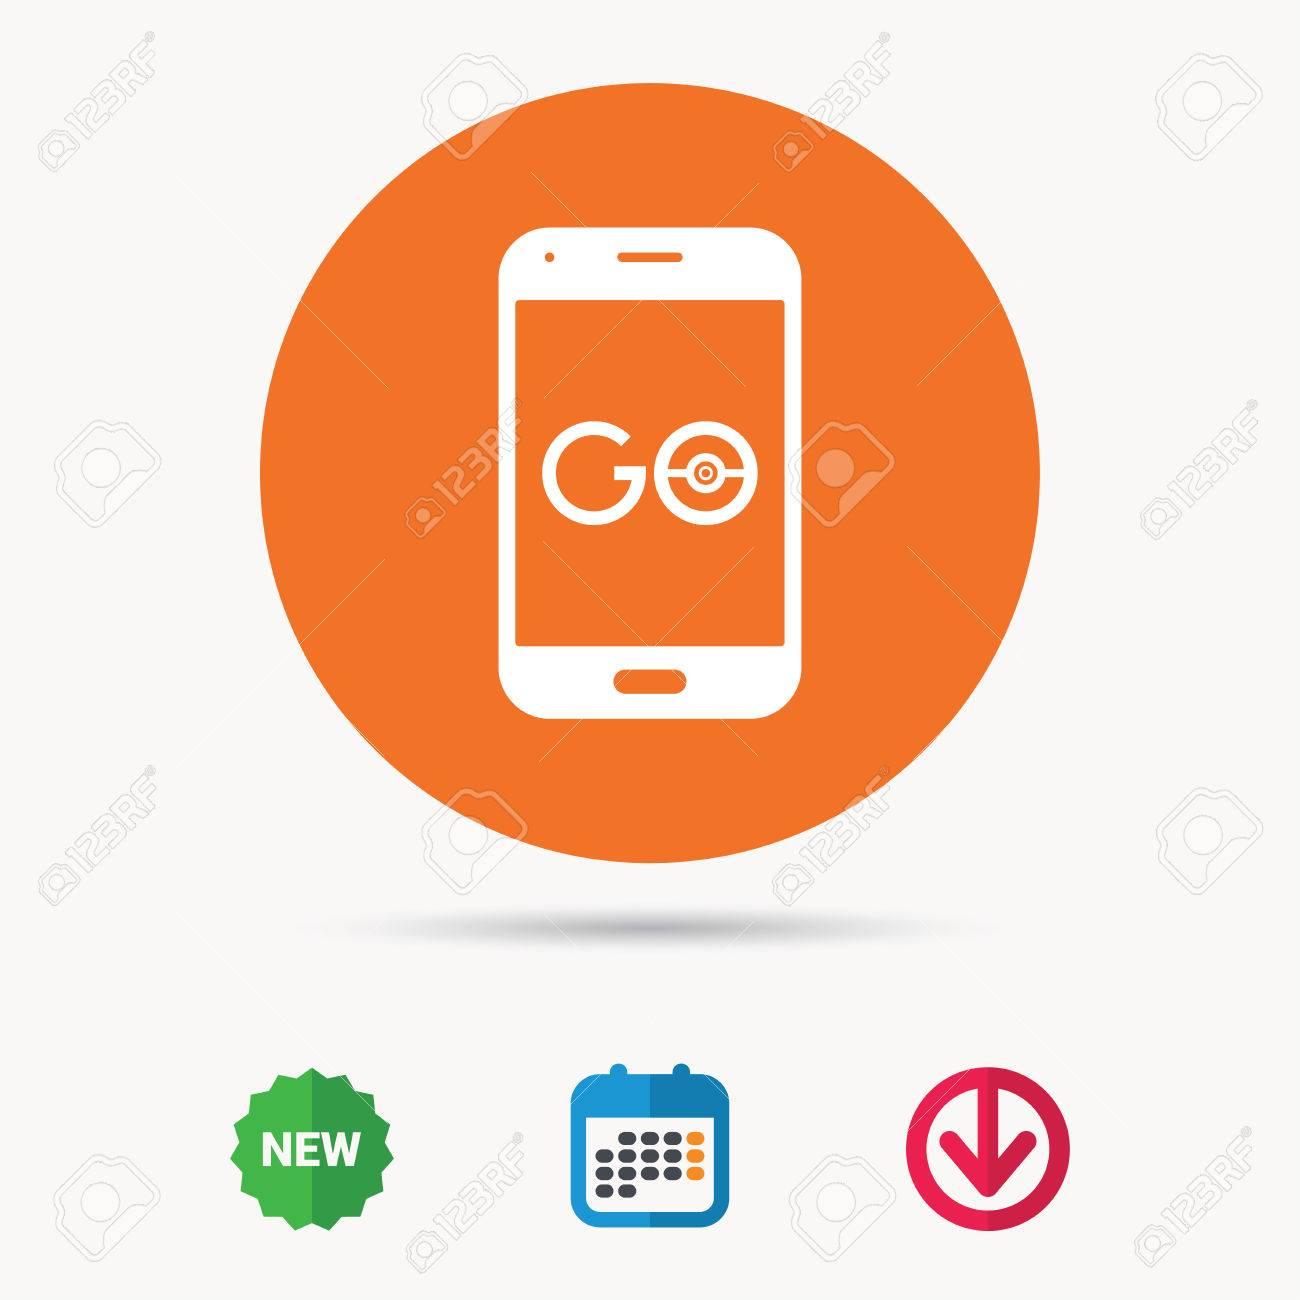 Smartphone game icon  Go symbol  Pokemon game concept  Calendar,